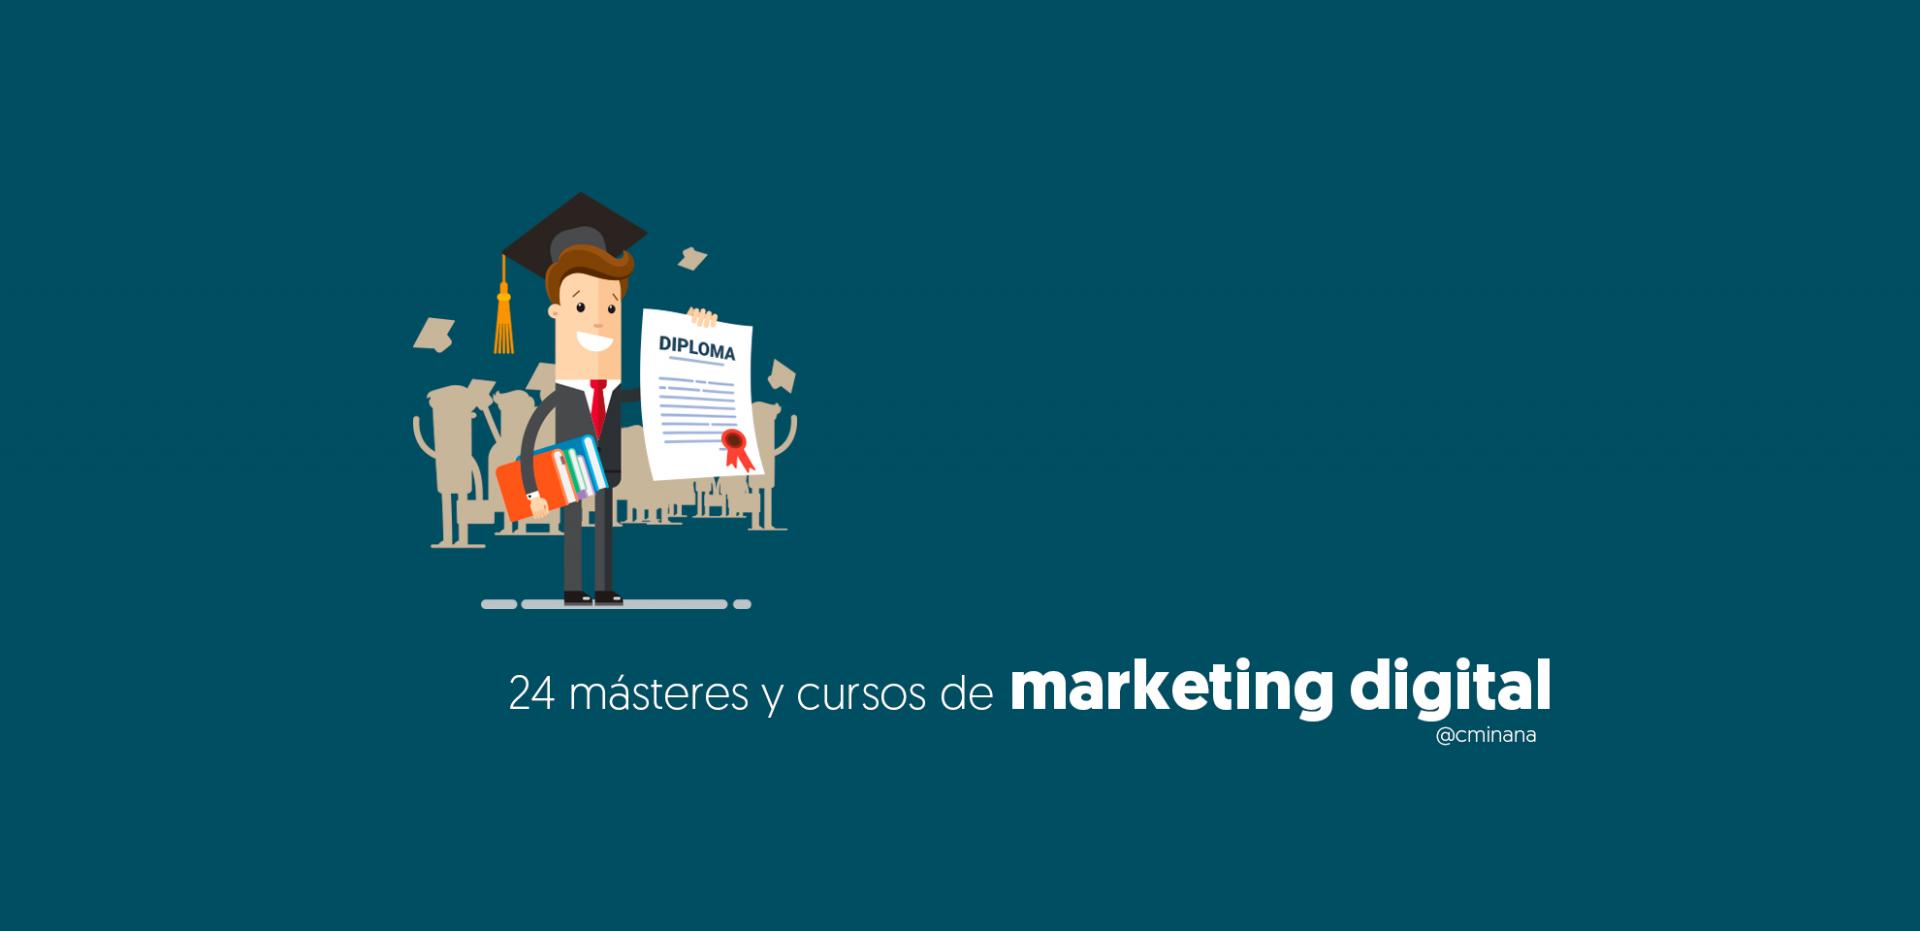 masteres cursos de marketing digital